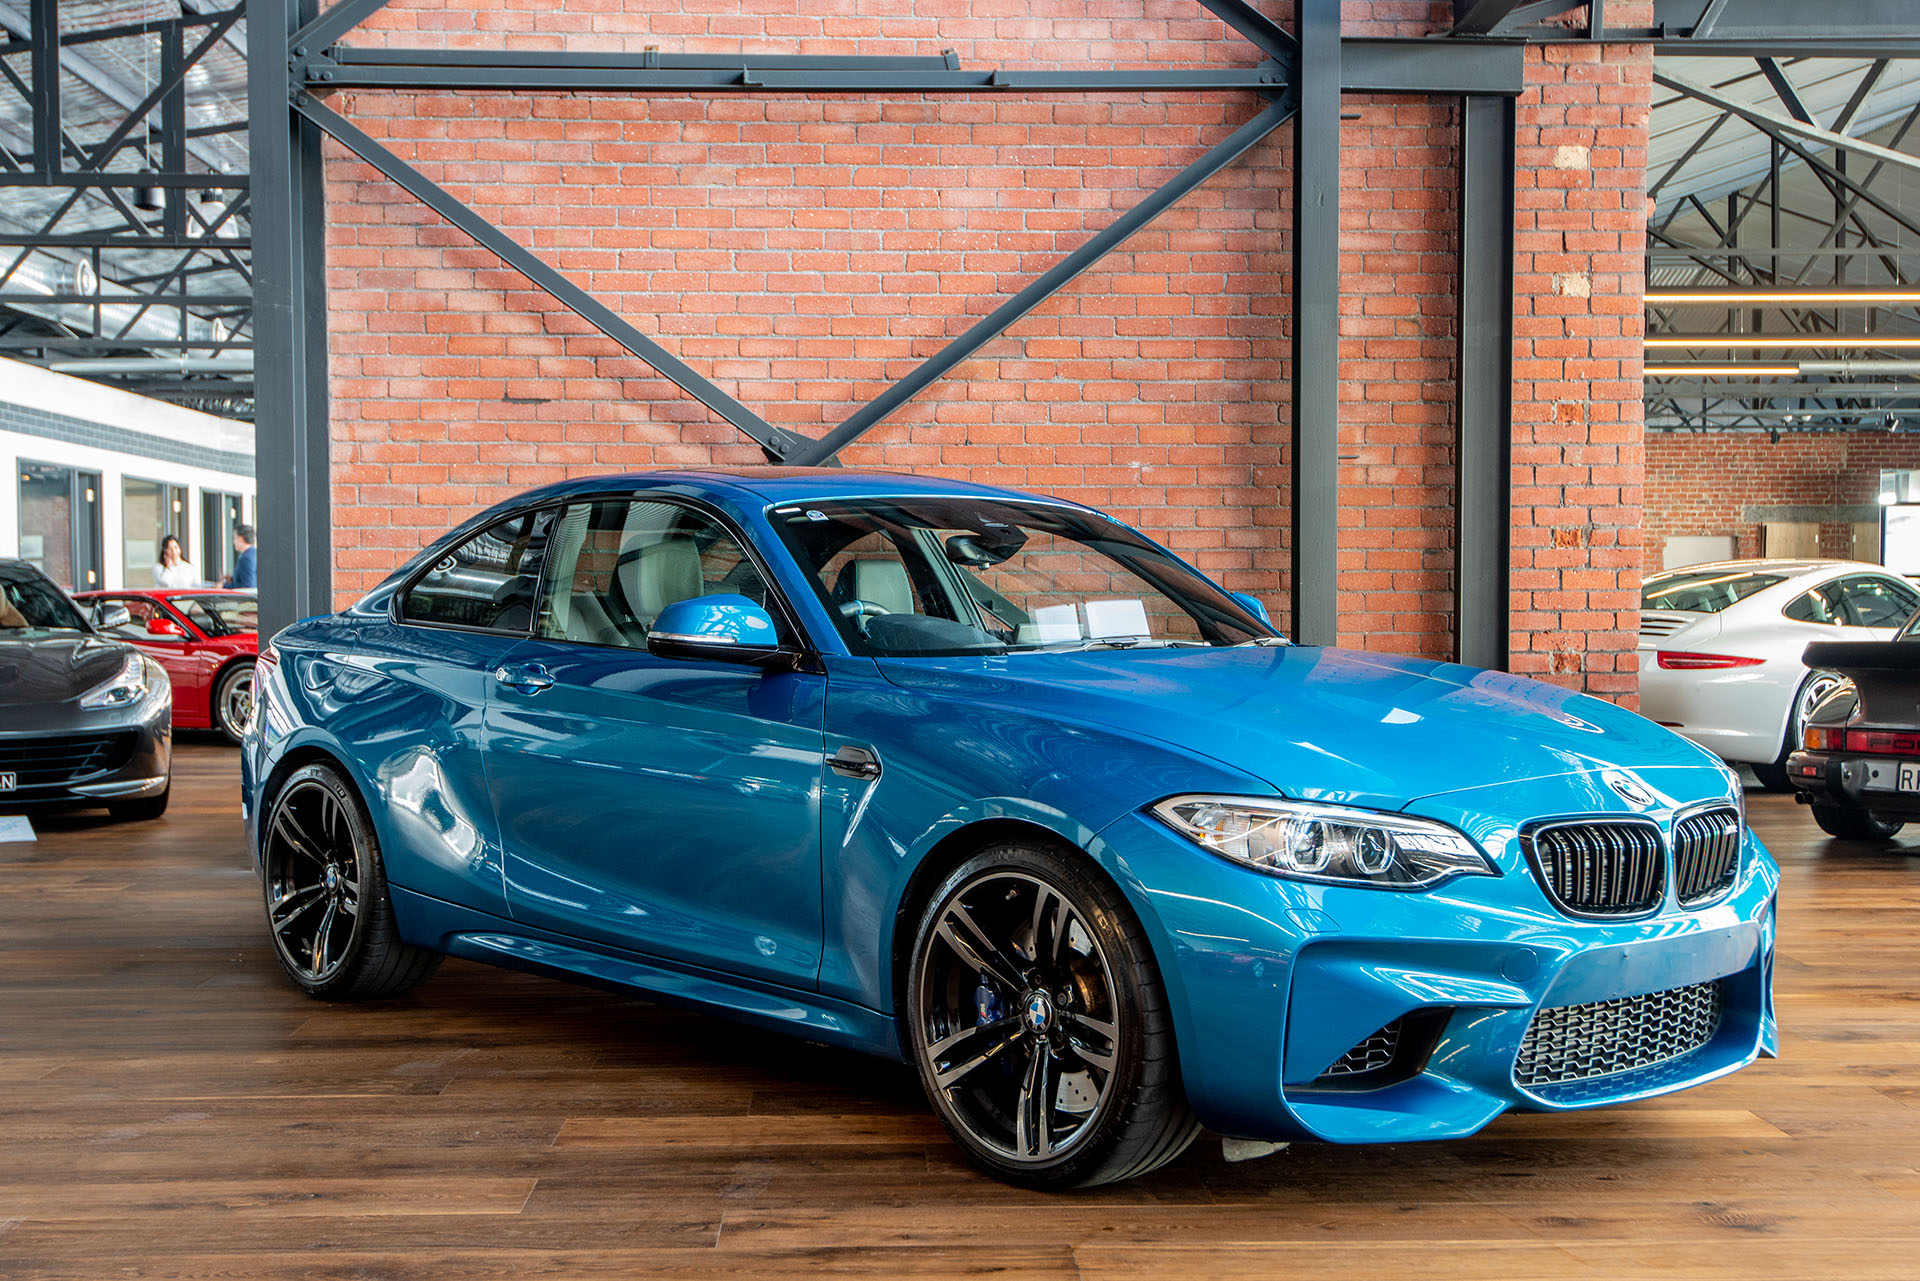 BMW M6 Forged Wheels Wallpaper   HD Car Wallpapers   ID #2695